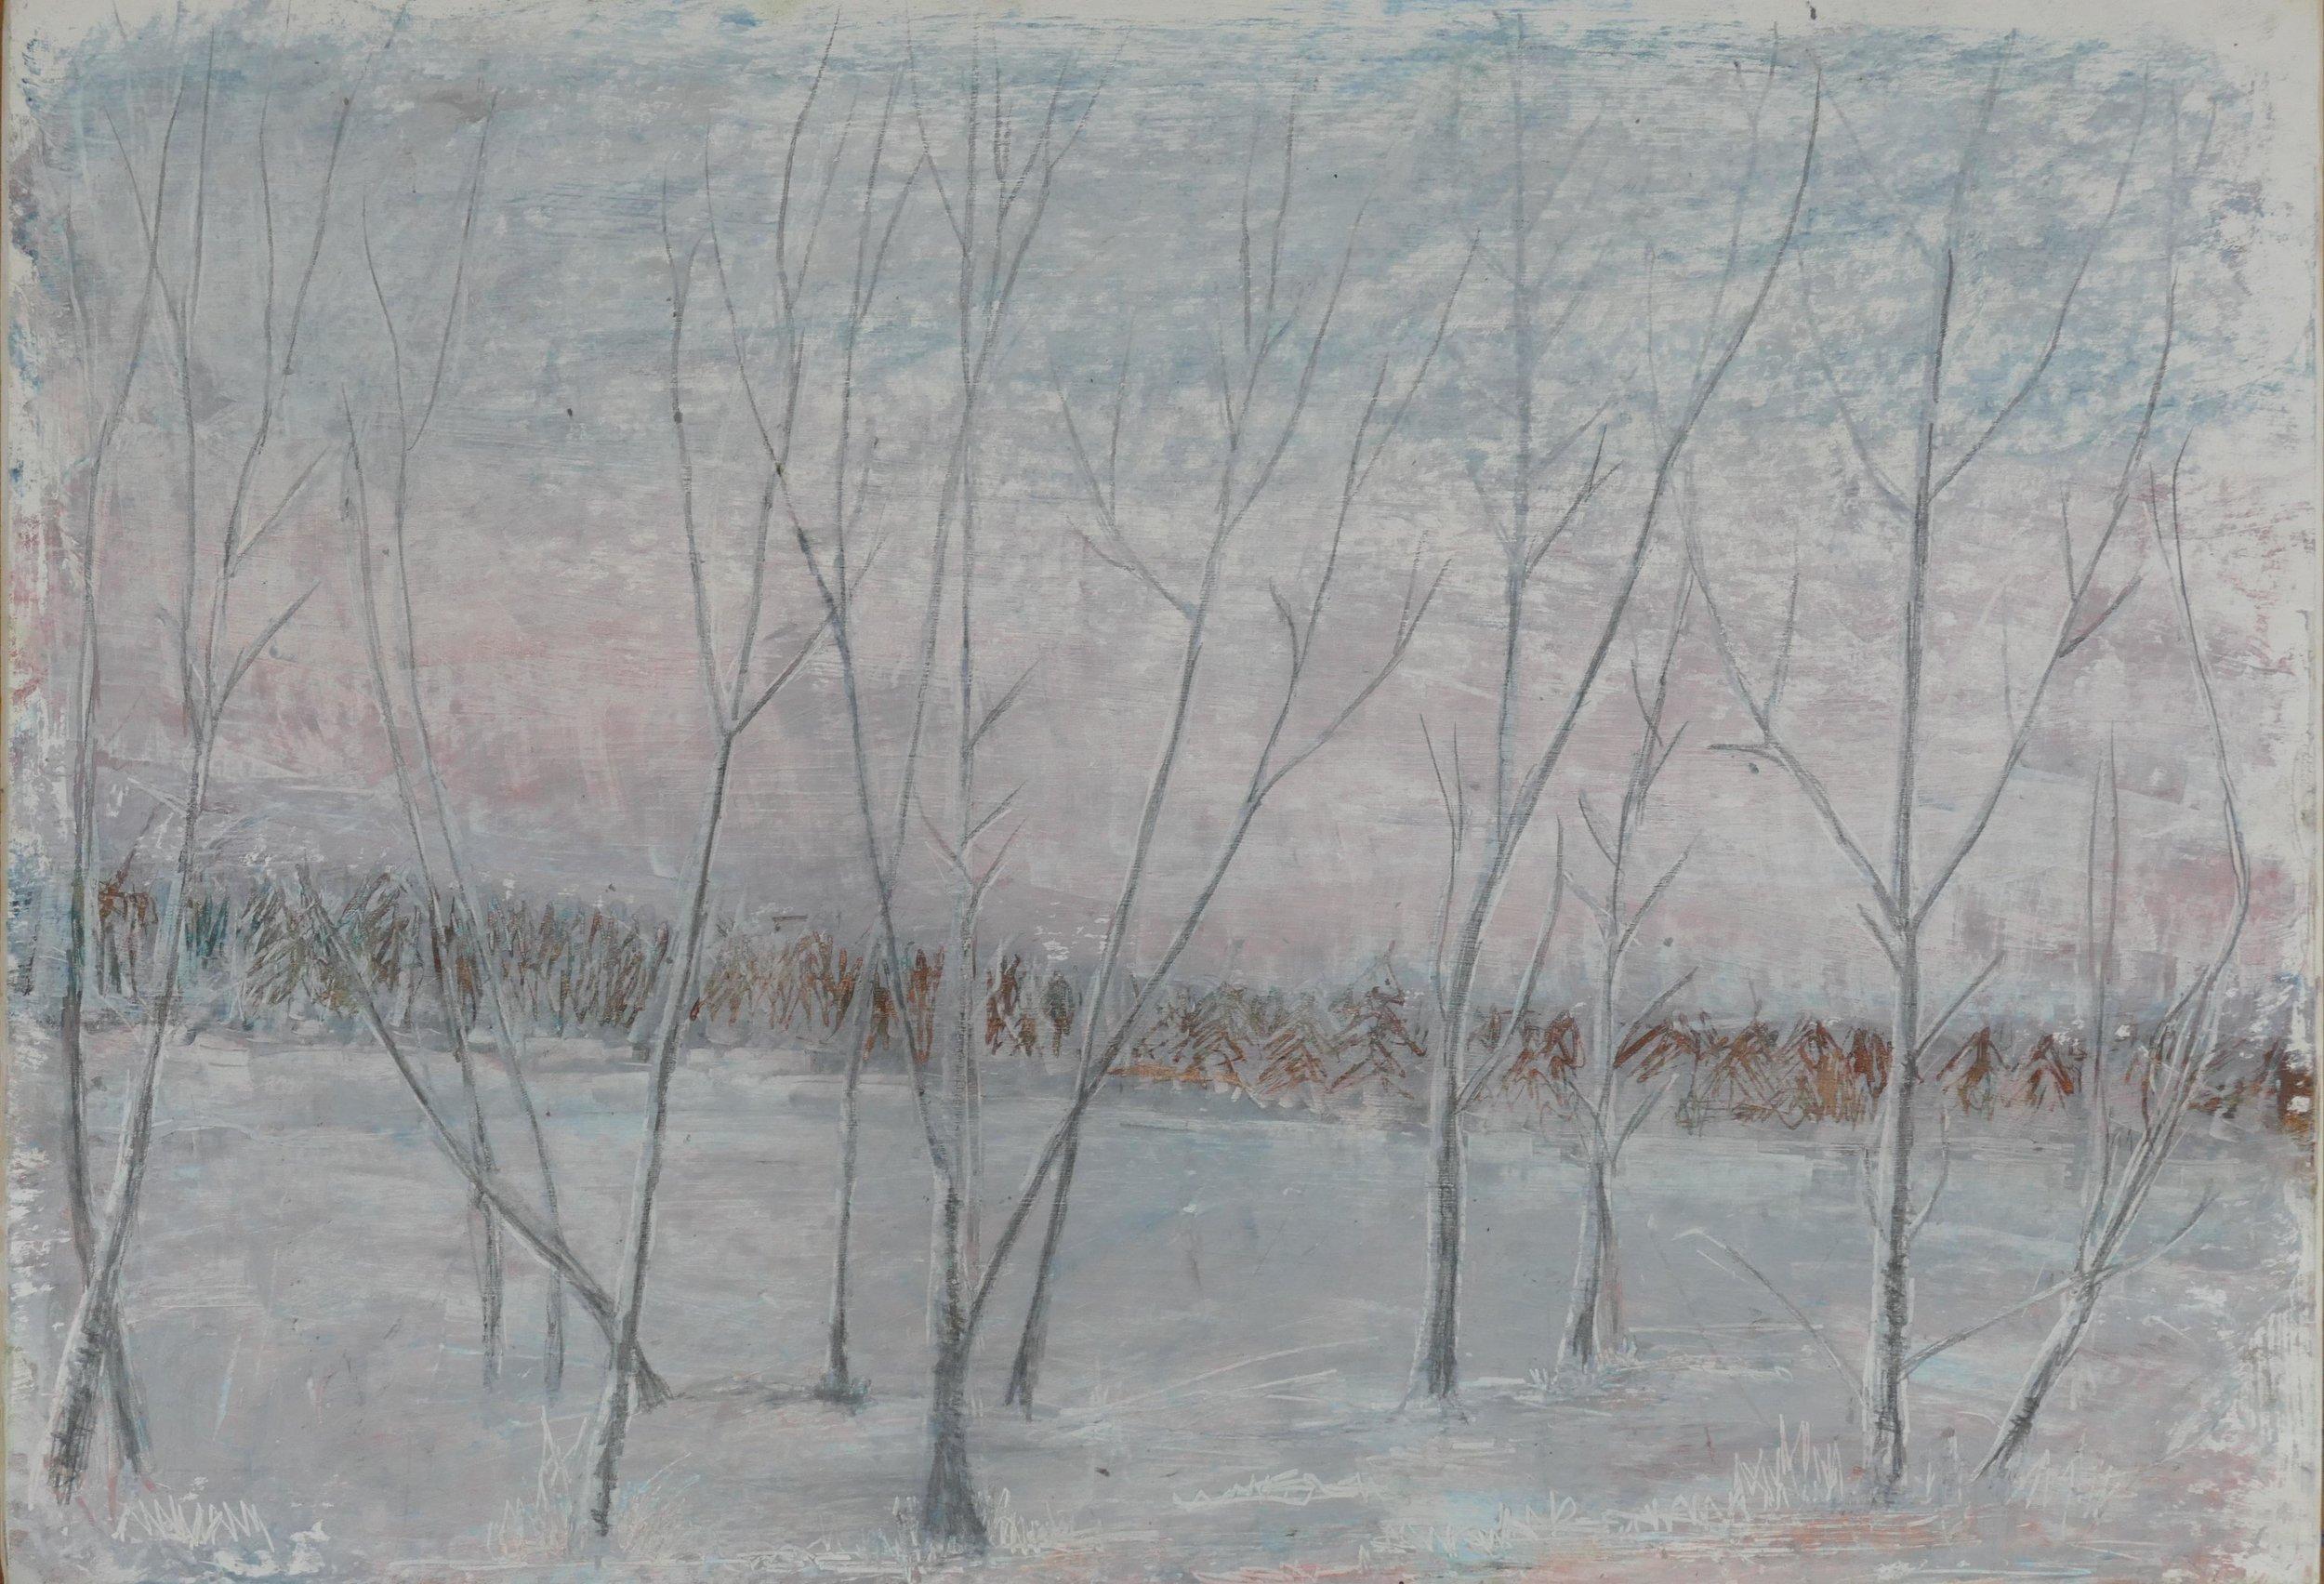 Print 24 - Winter - Size: 140 x 475